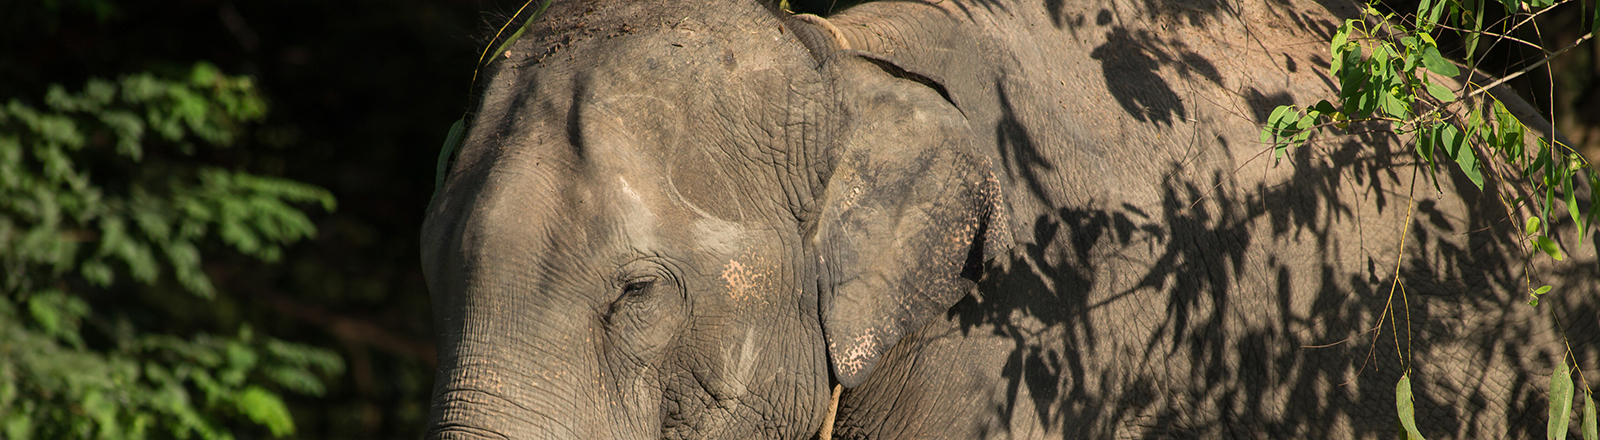 Asiatischer Elefant in Thailand